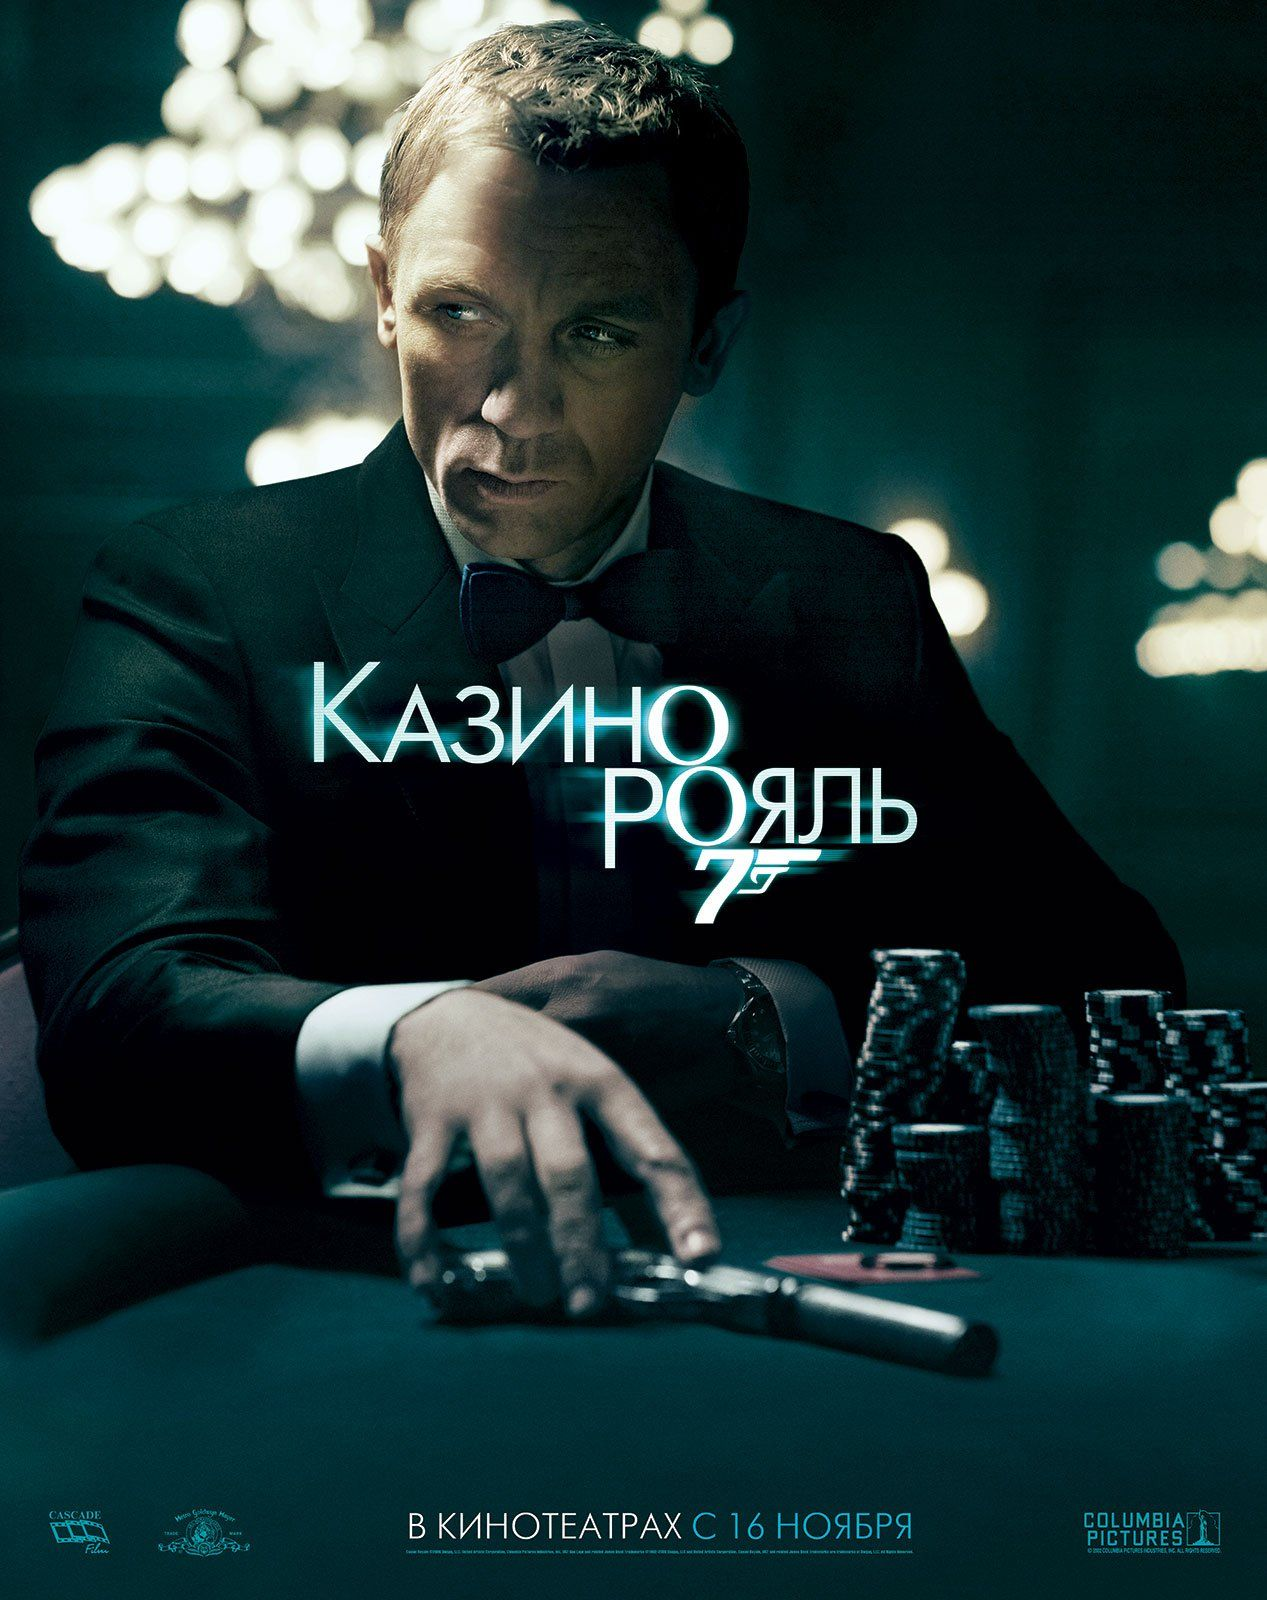 English movies on casino woodbine slots address